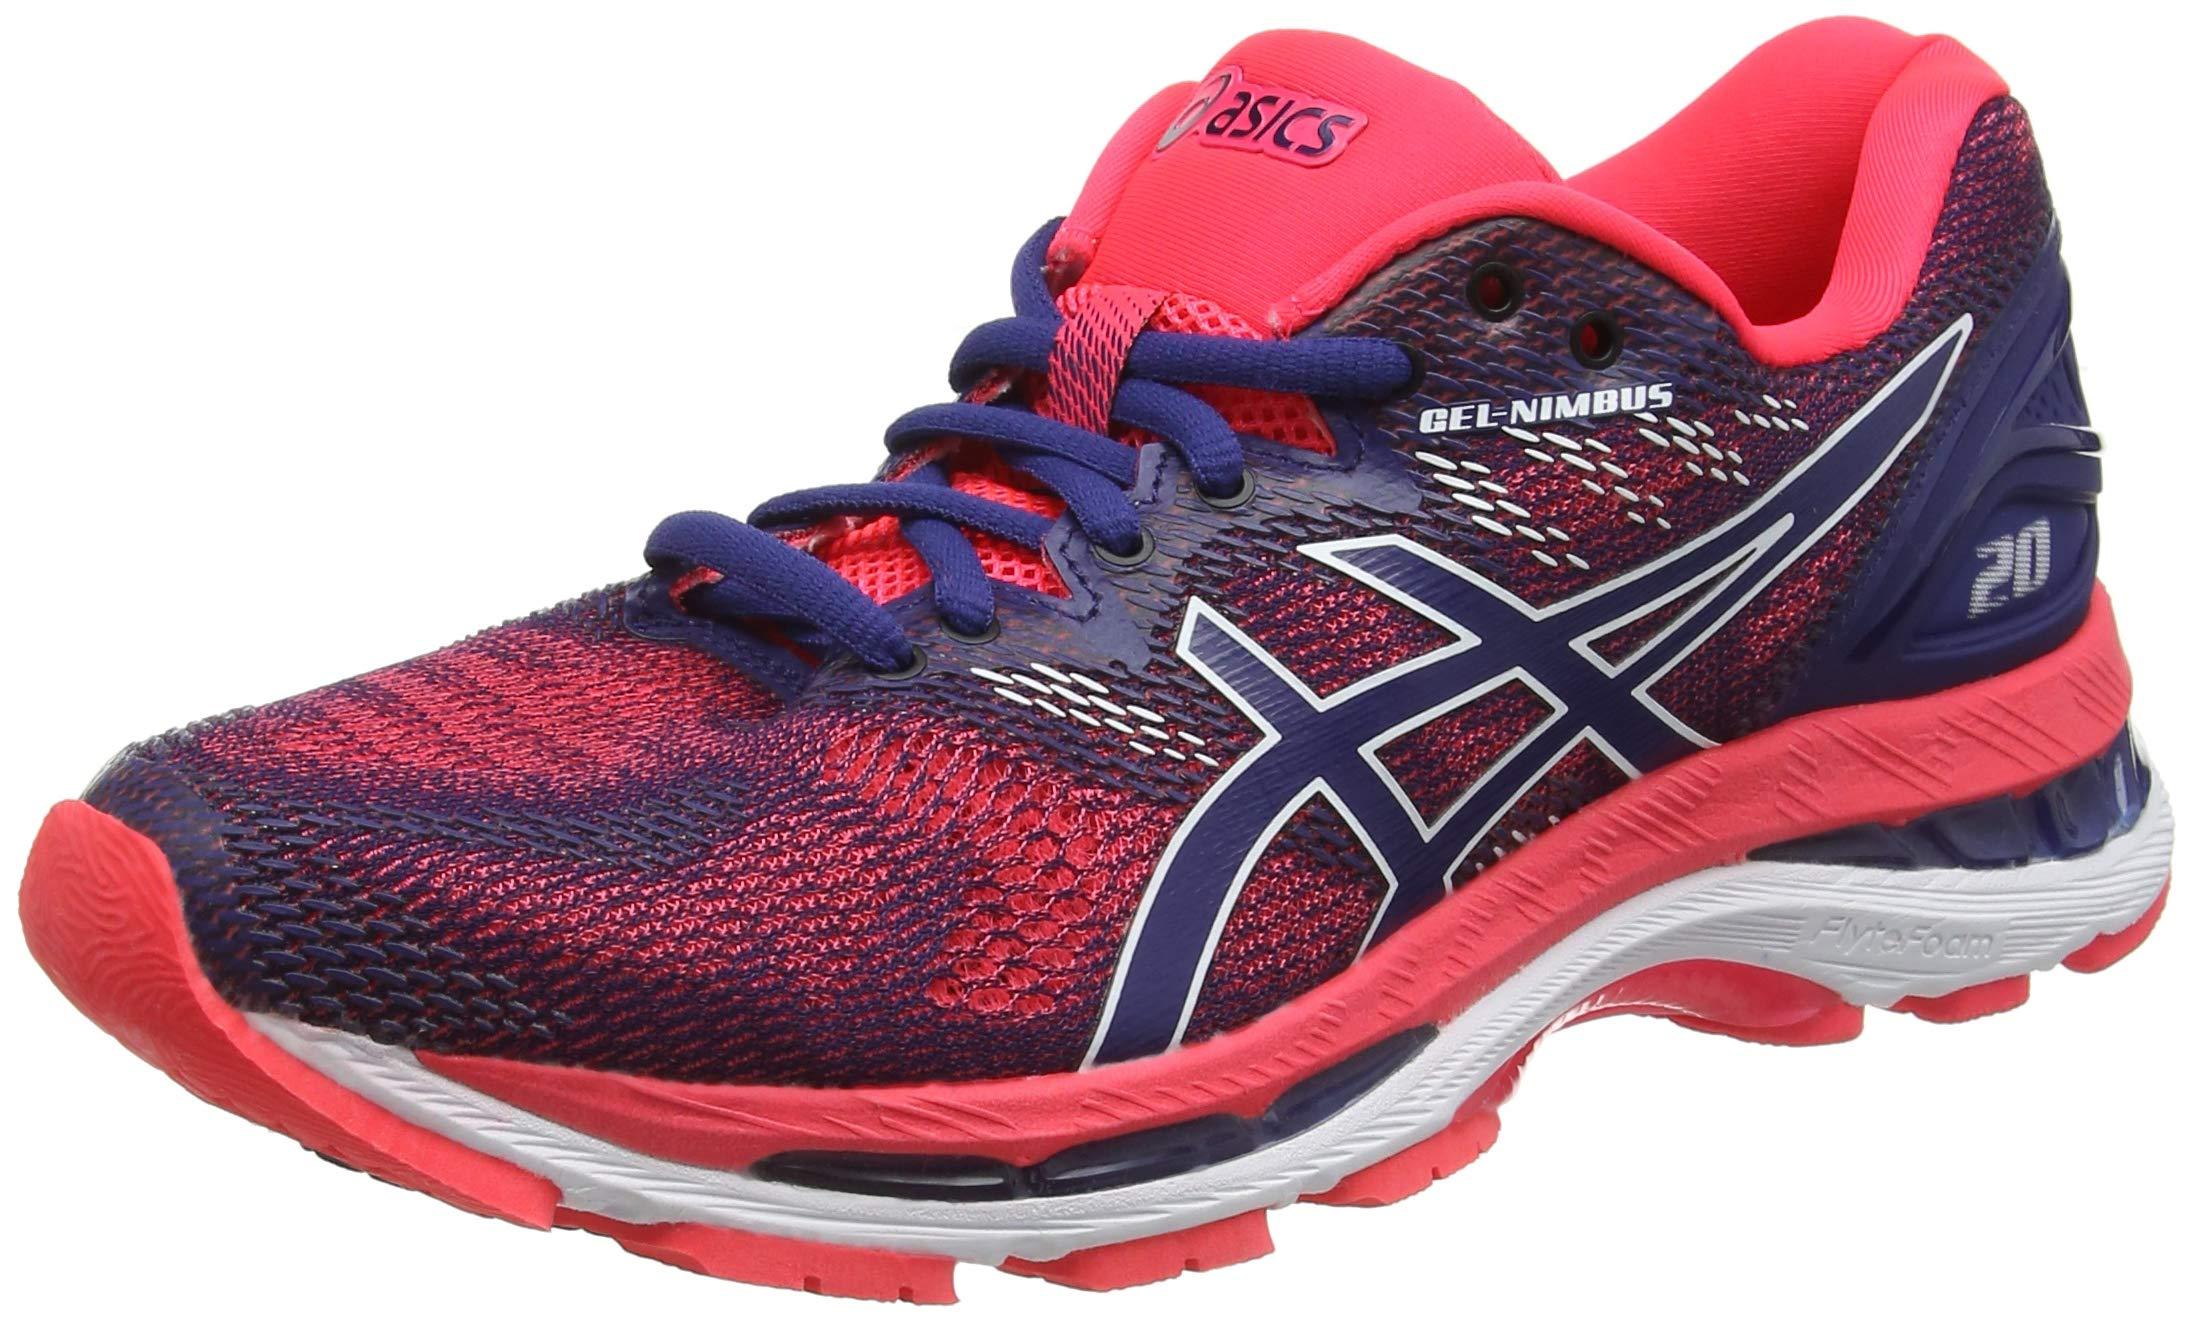 Top Chaussures de running femme selon les notes Amazon.fr